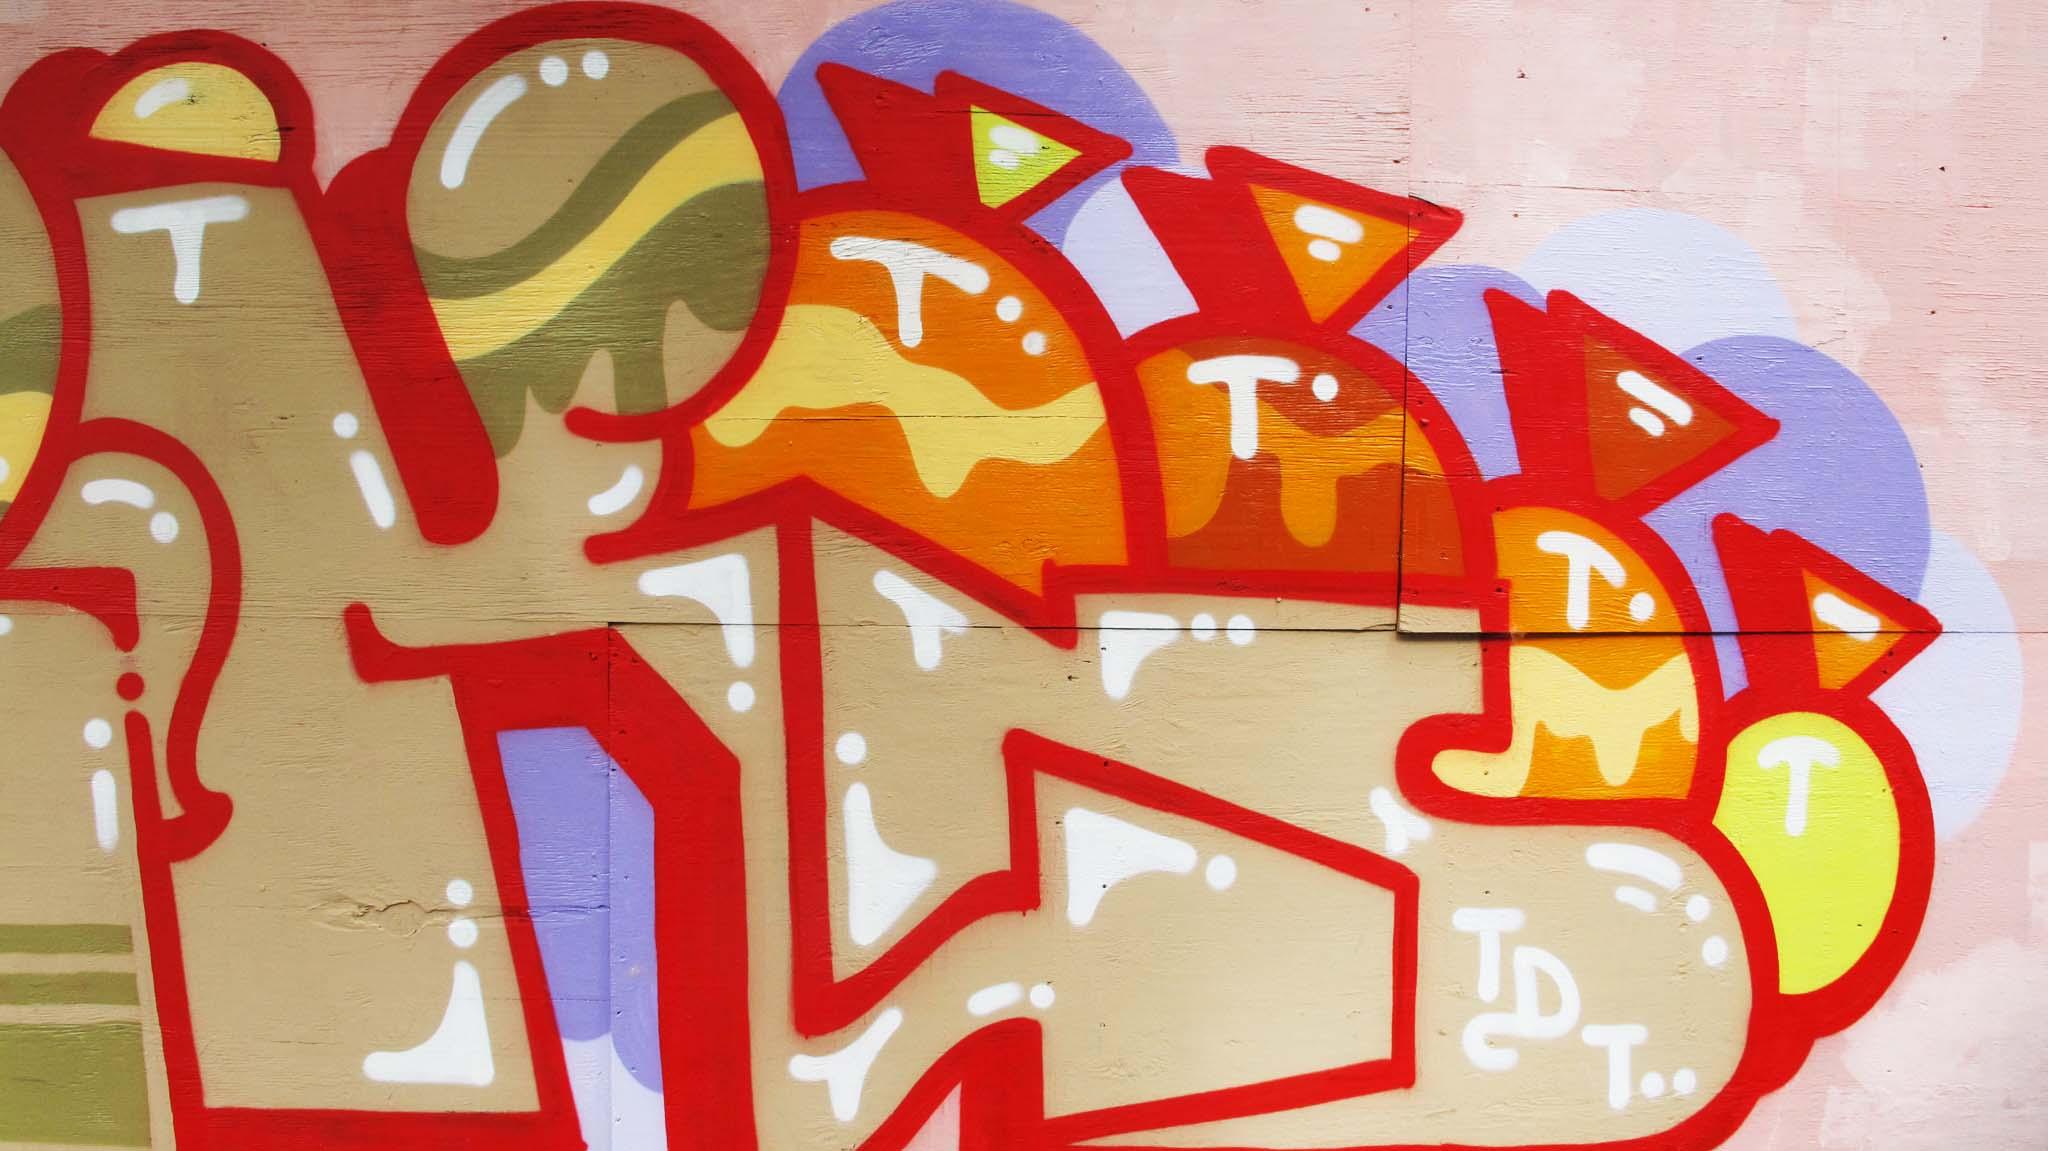 onek nm graffitti manchester england